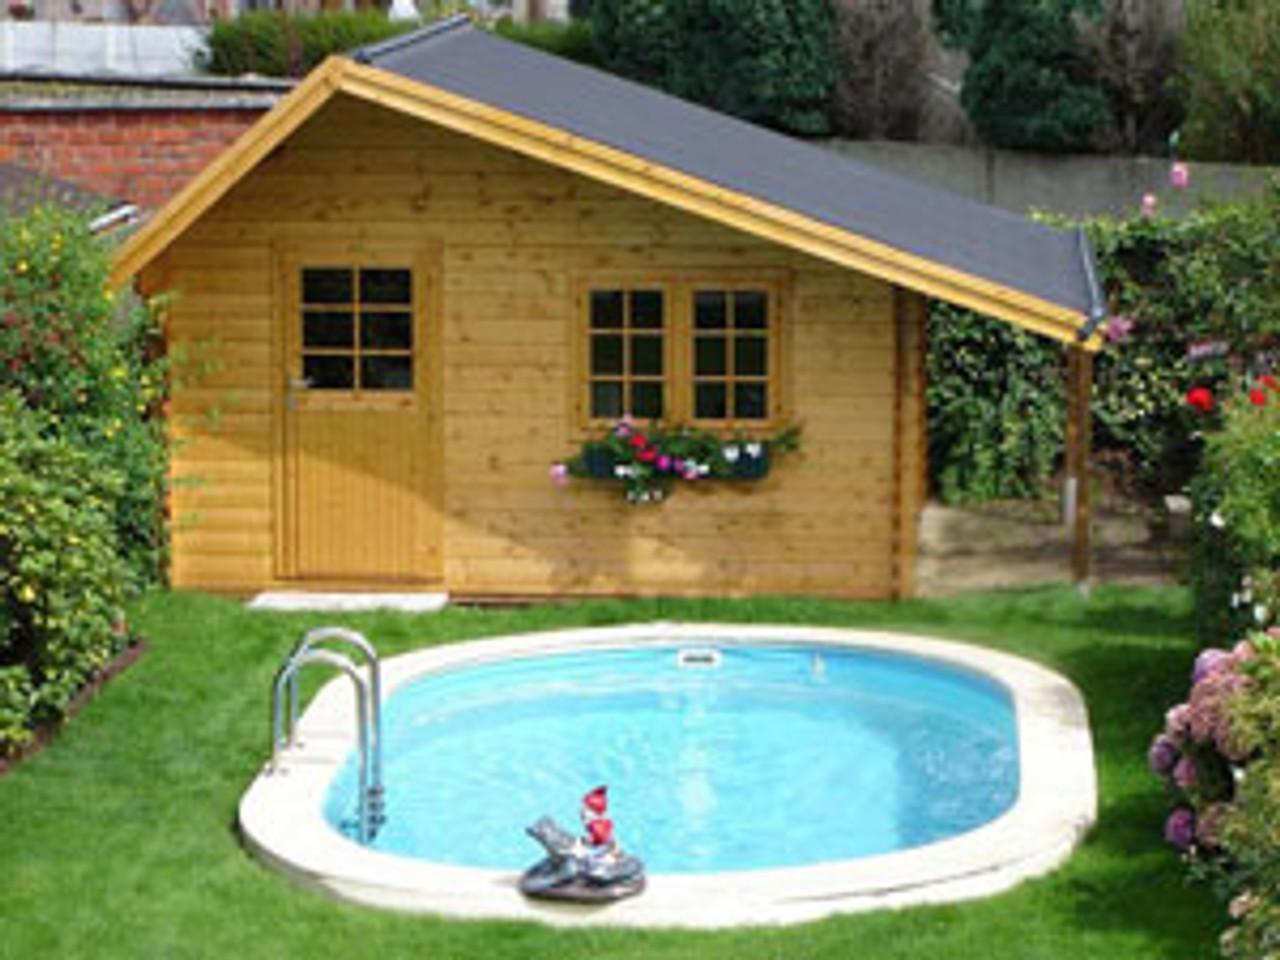 Poolsolar Swimming pool heating matting systems